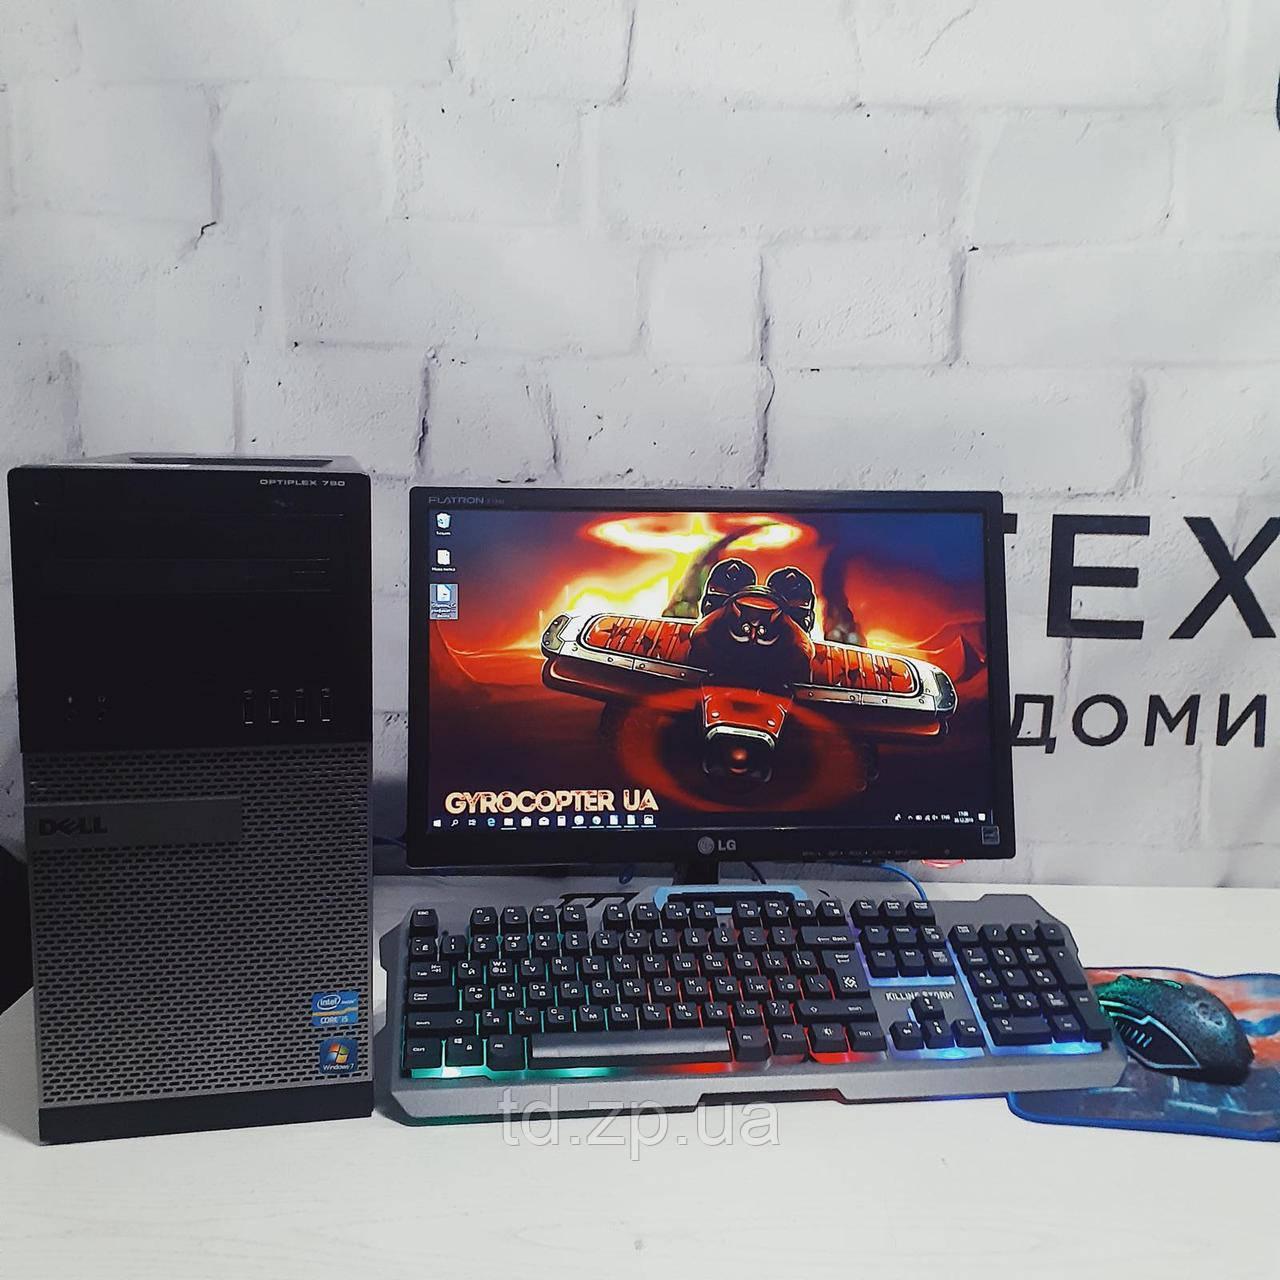 Игровой компьютер Intel core i3-3220 + NVIDIA GeForce GTX 750ti  2Gb + RAM 4Gb + HDD 320Gb